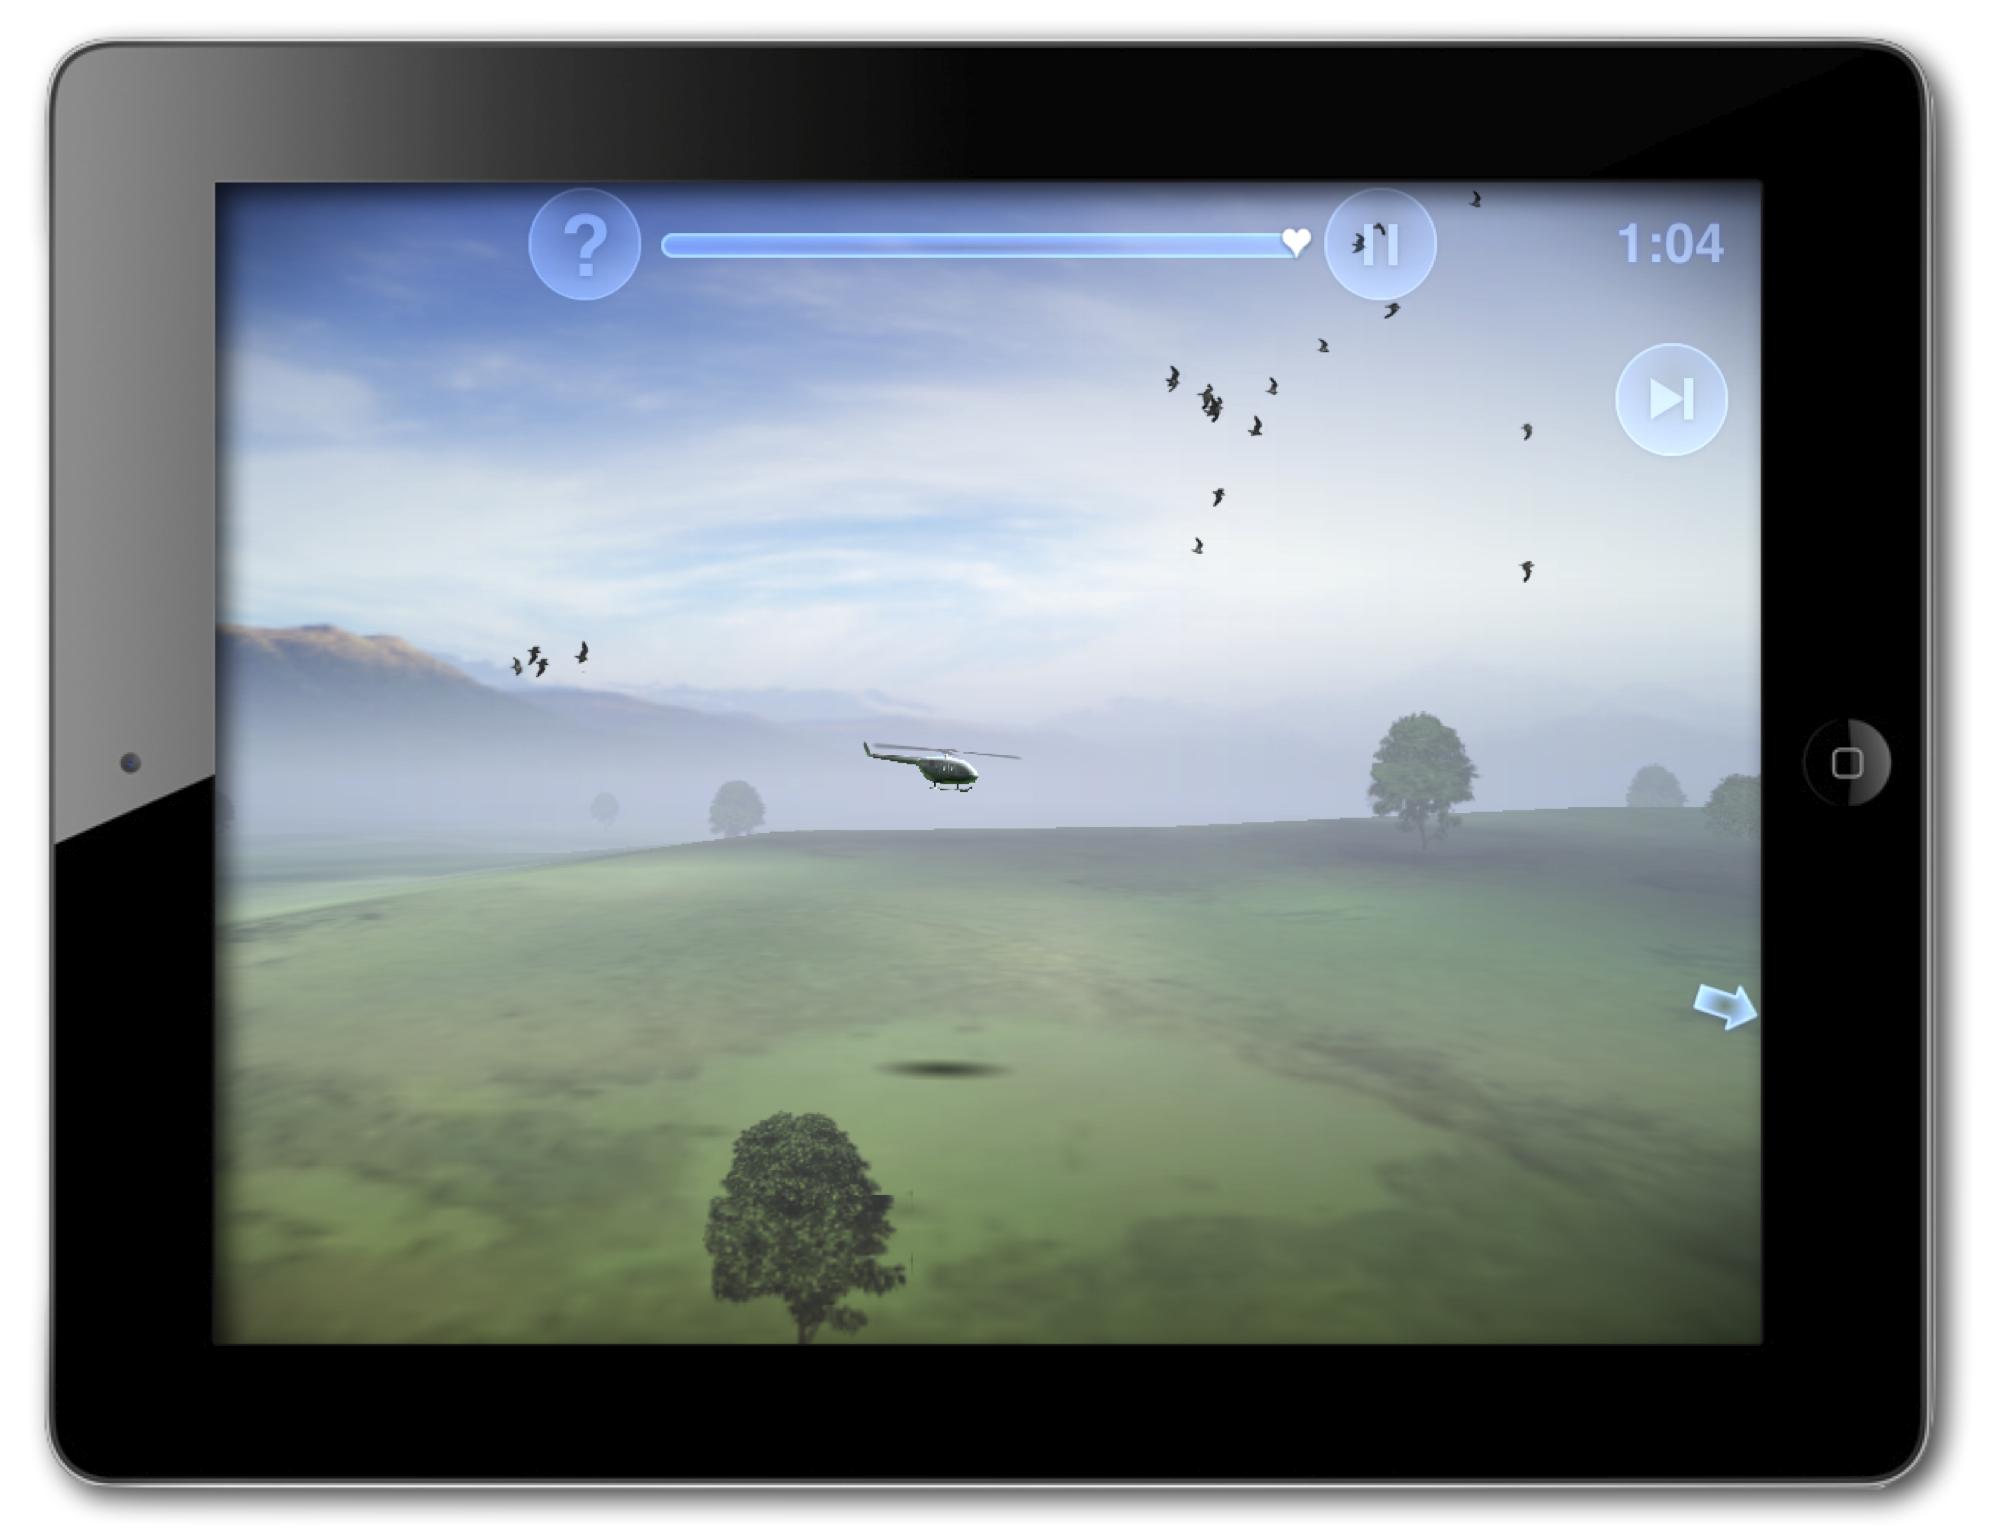 Chopper 2 on iPad 2